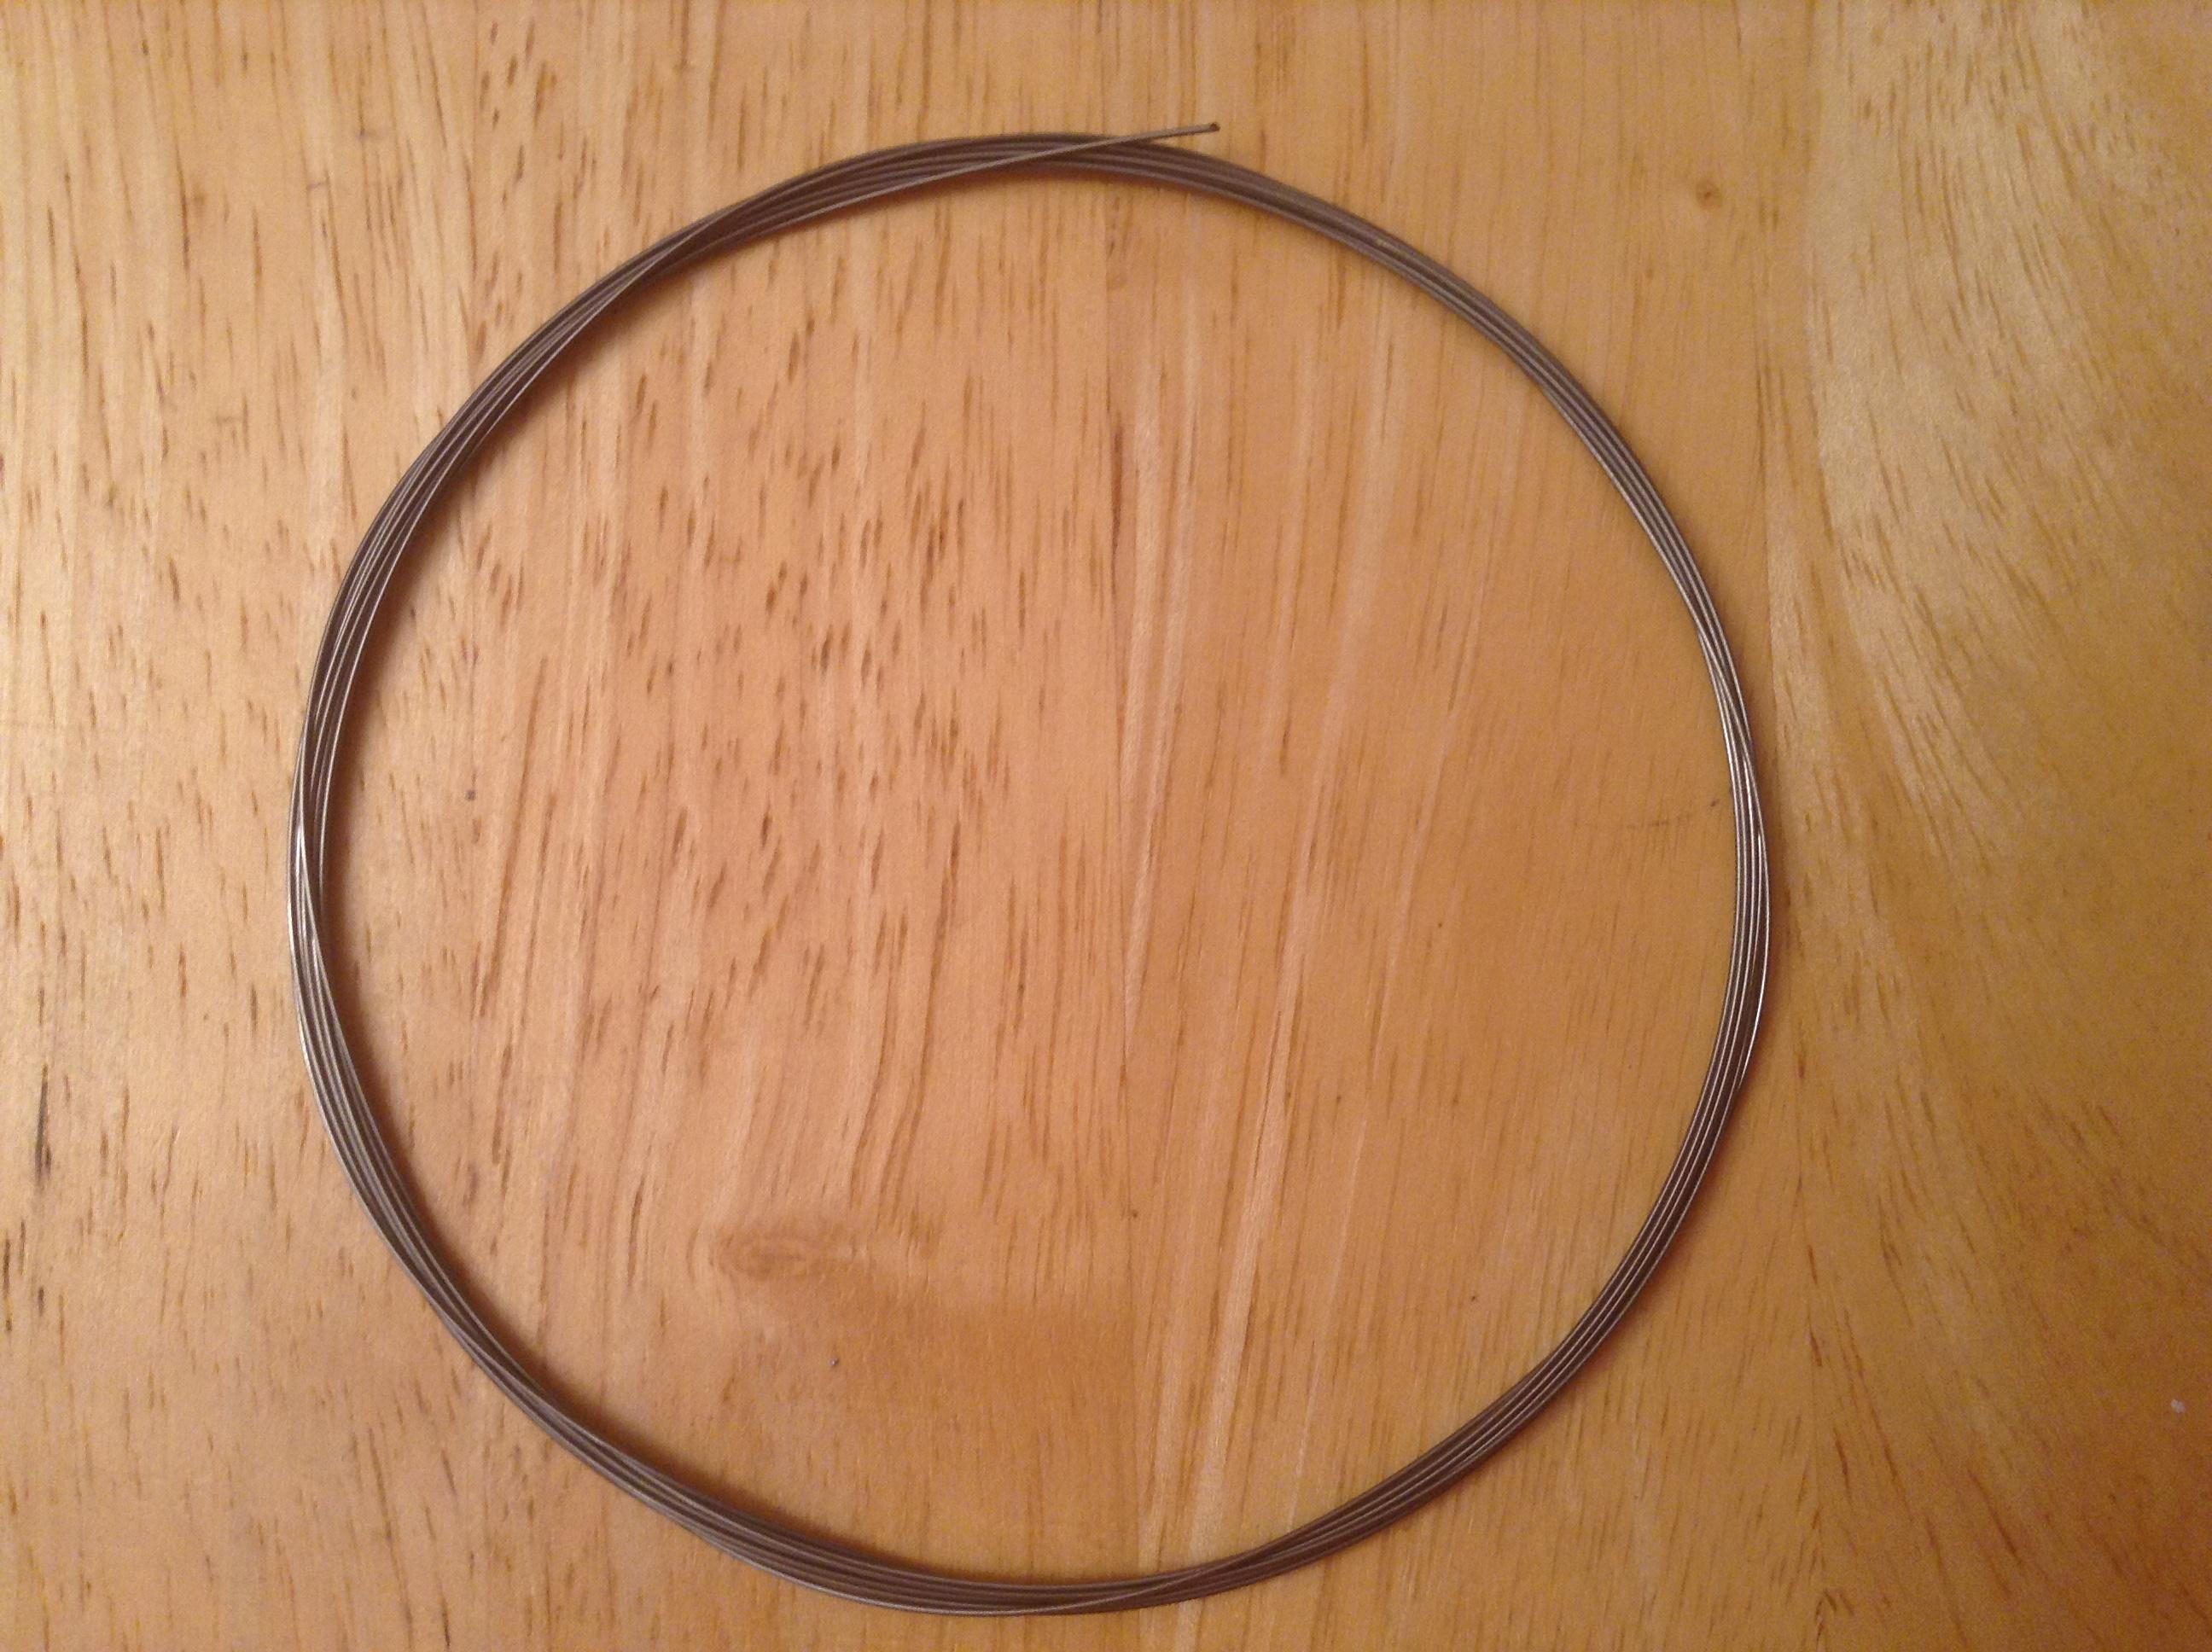 1004 Steel Wire